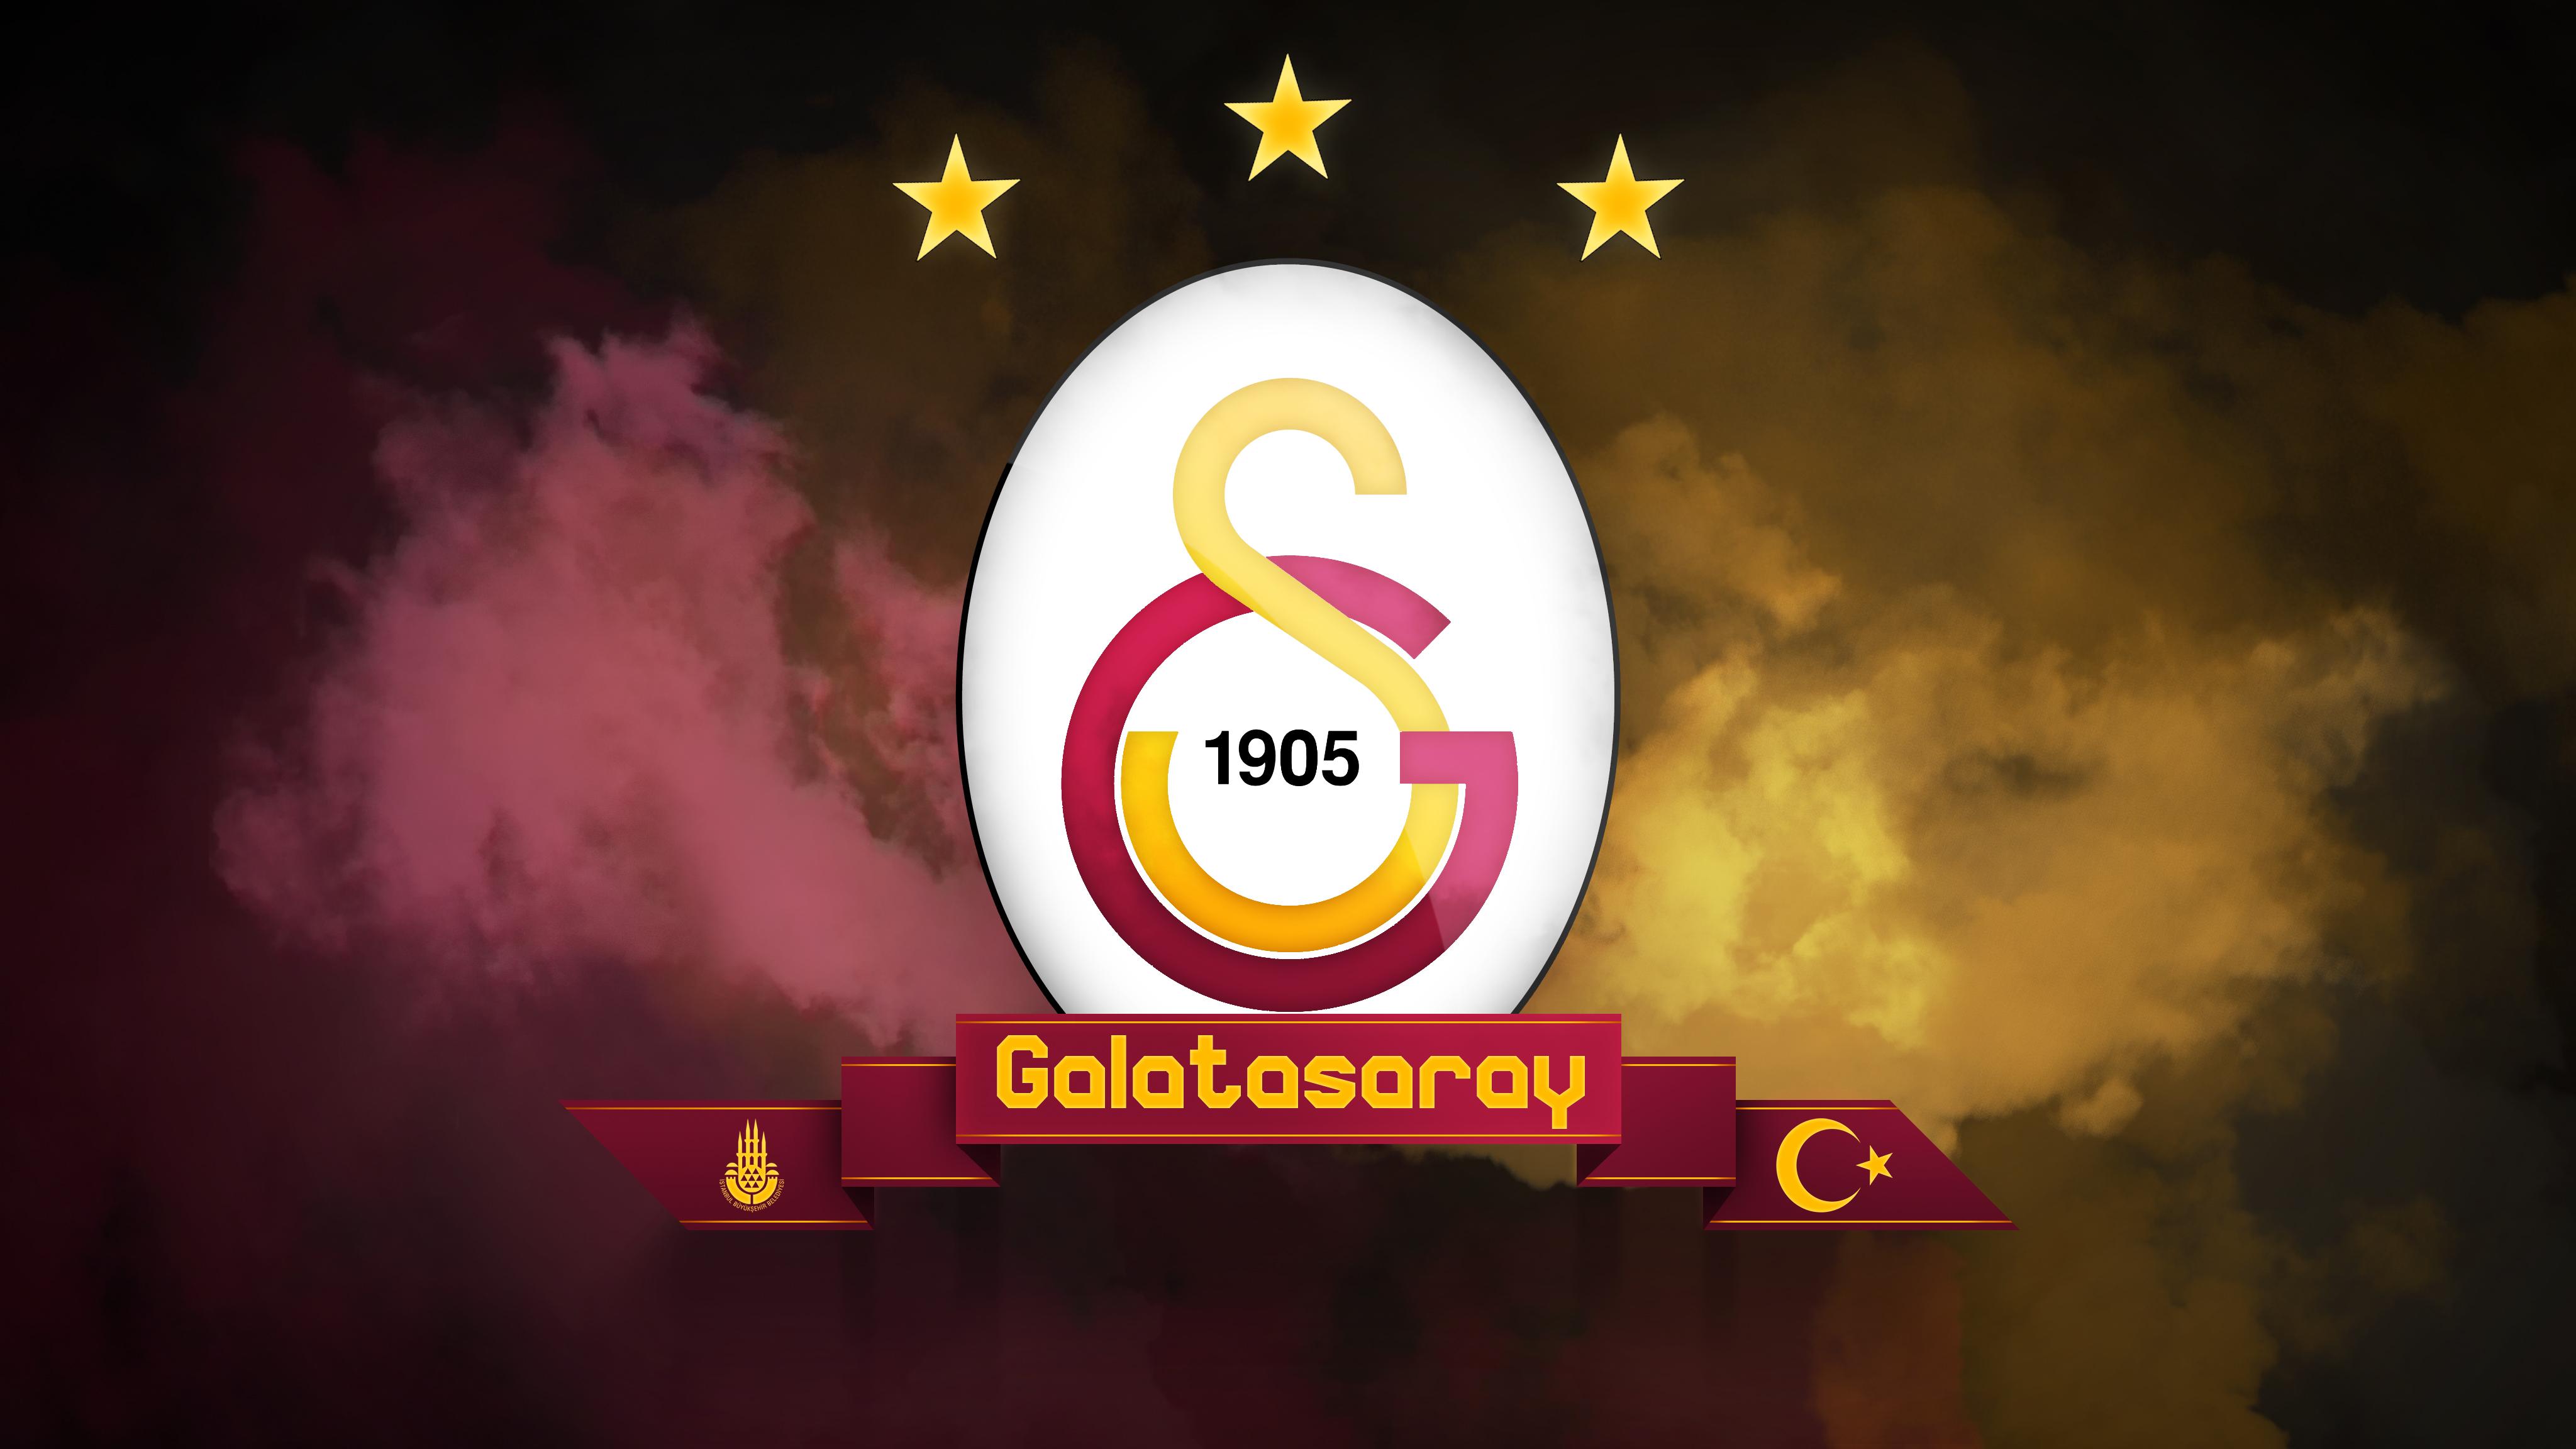 Galatasaray Wallpaper 4k Smoke By Darklmx On Deviantart